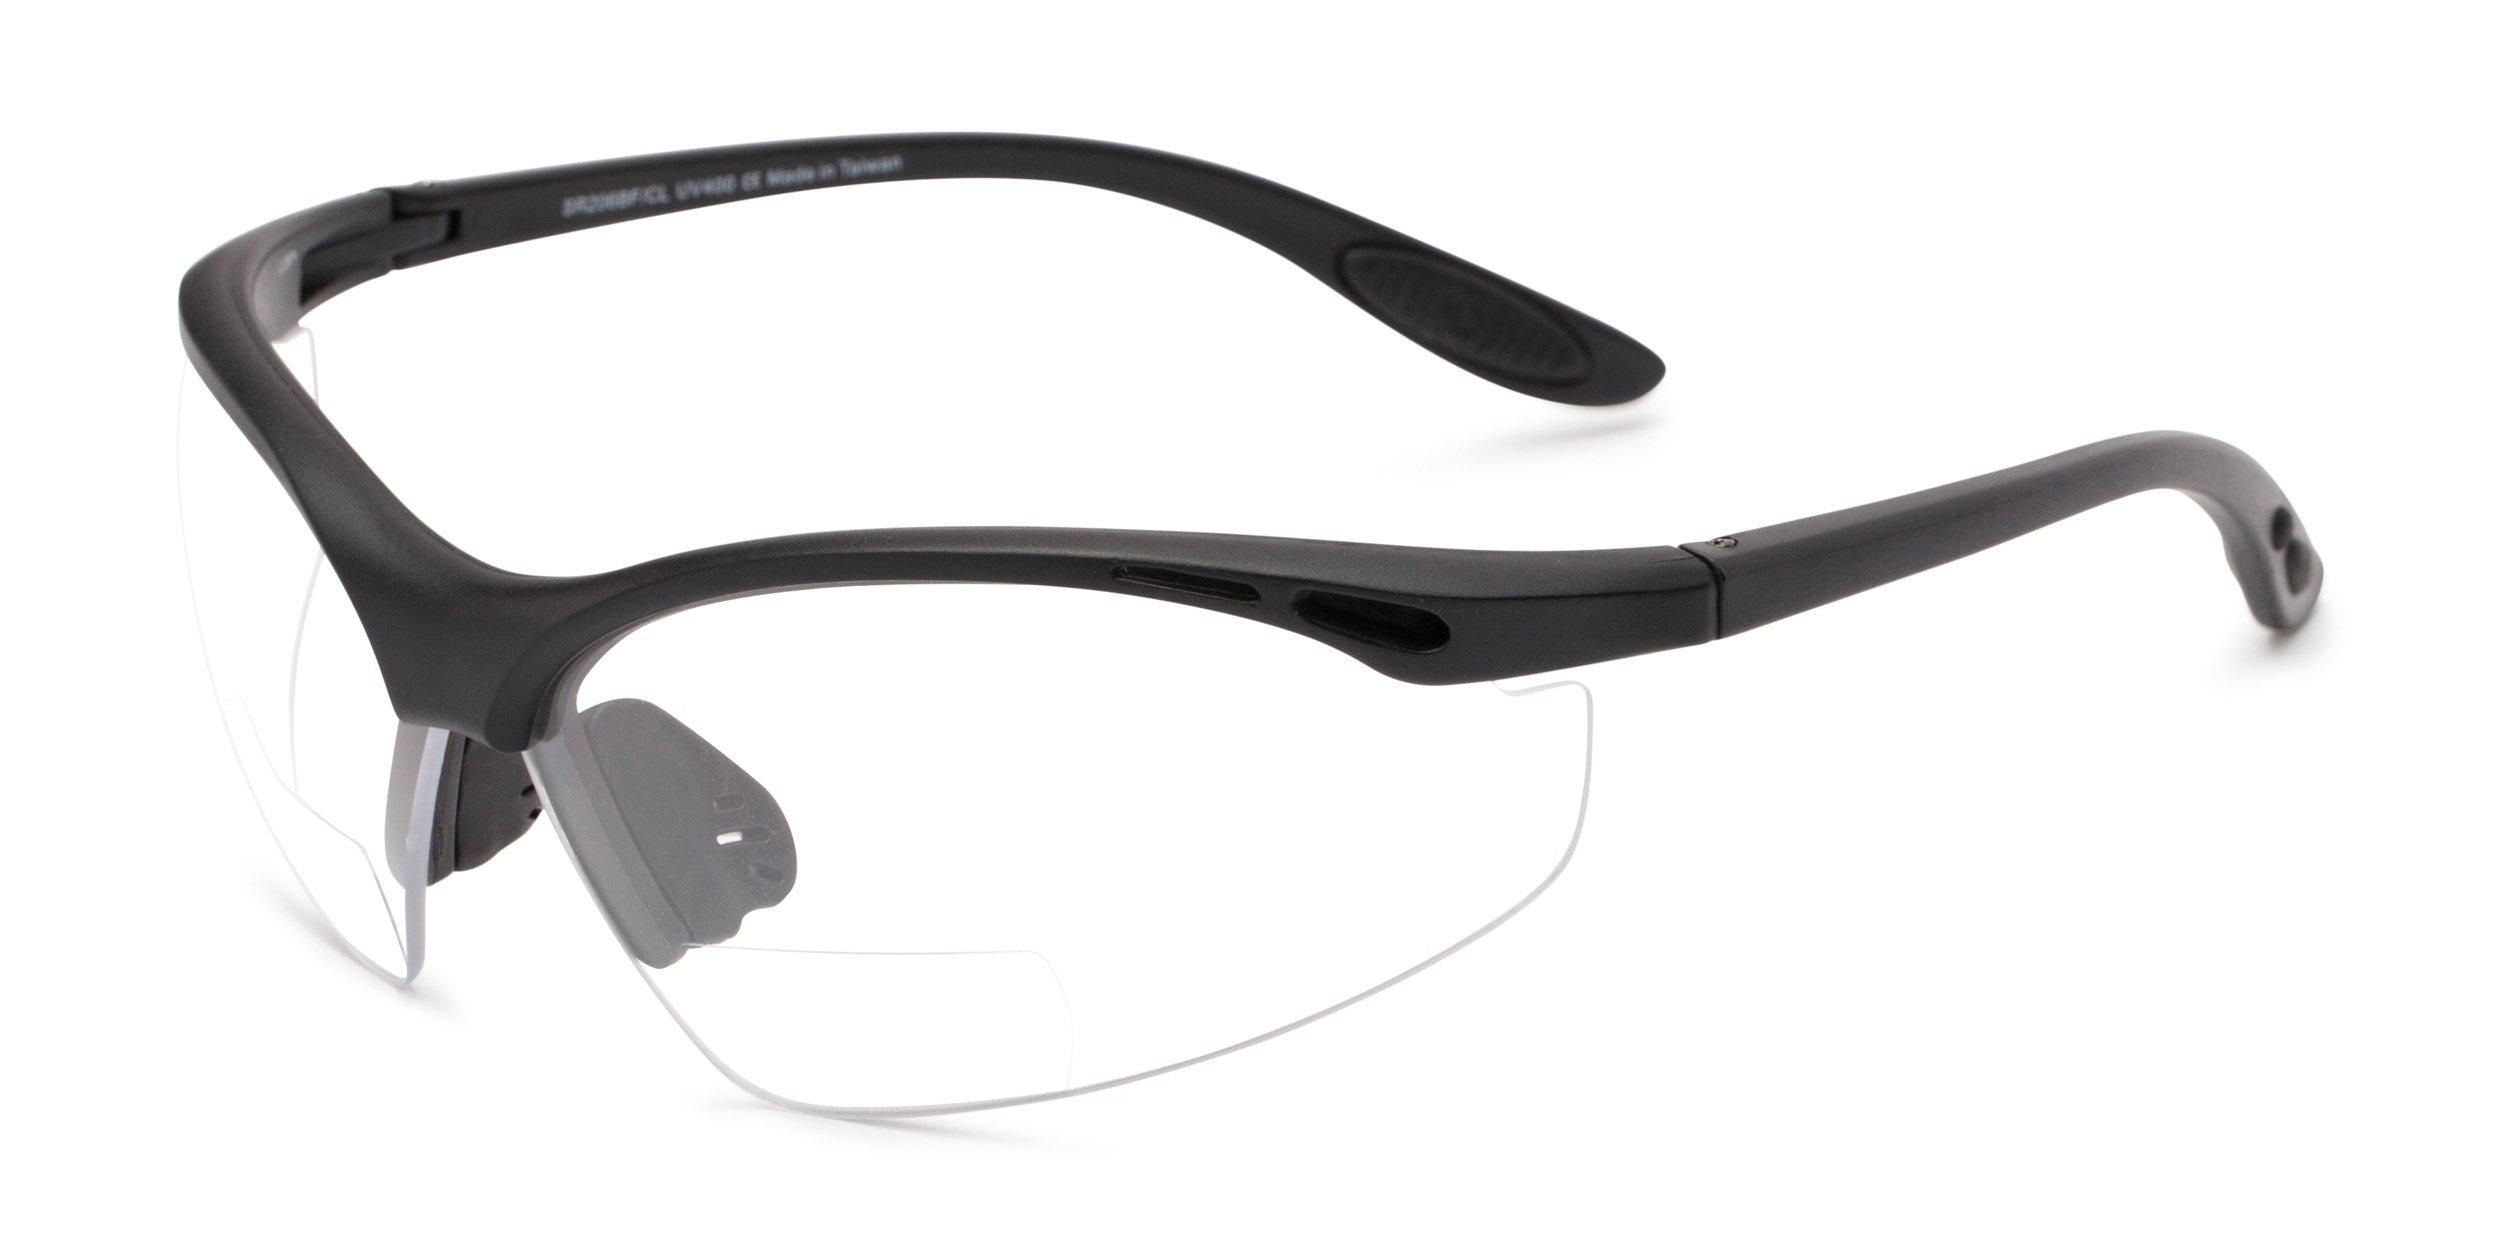 Readers.com | The Cooper Bifocal Safety Reader +1.50 Matte Black Frame with Clear Lenses Reading Glasses